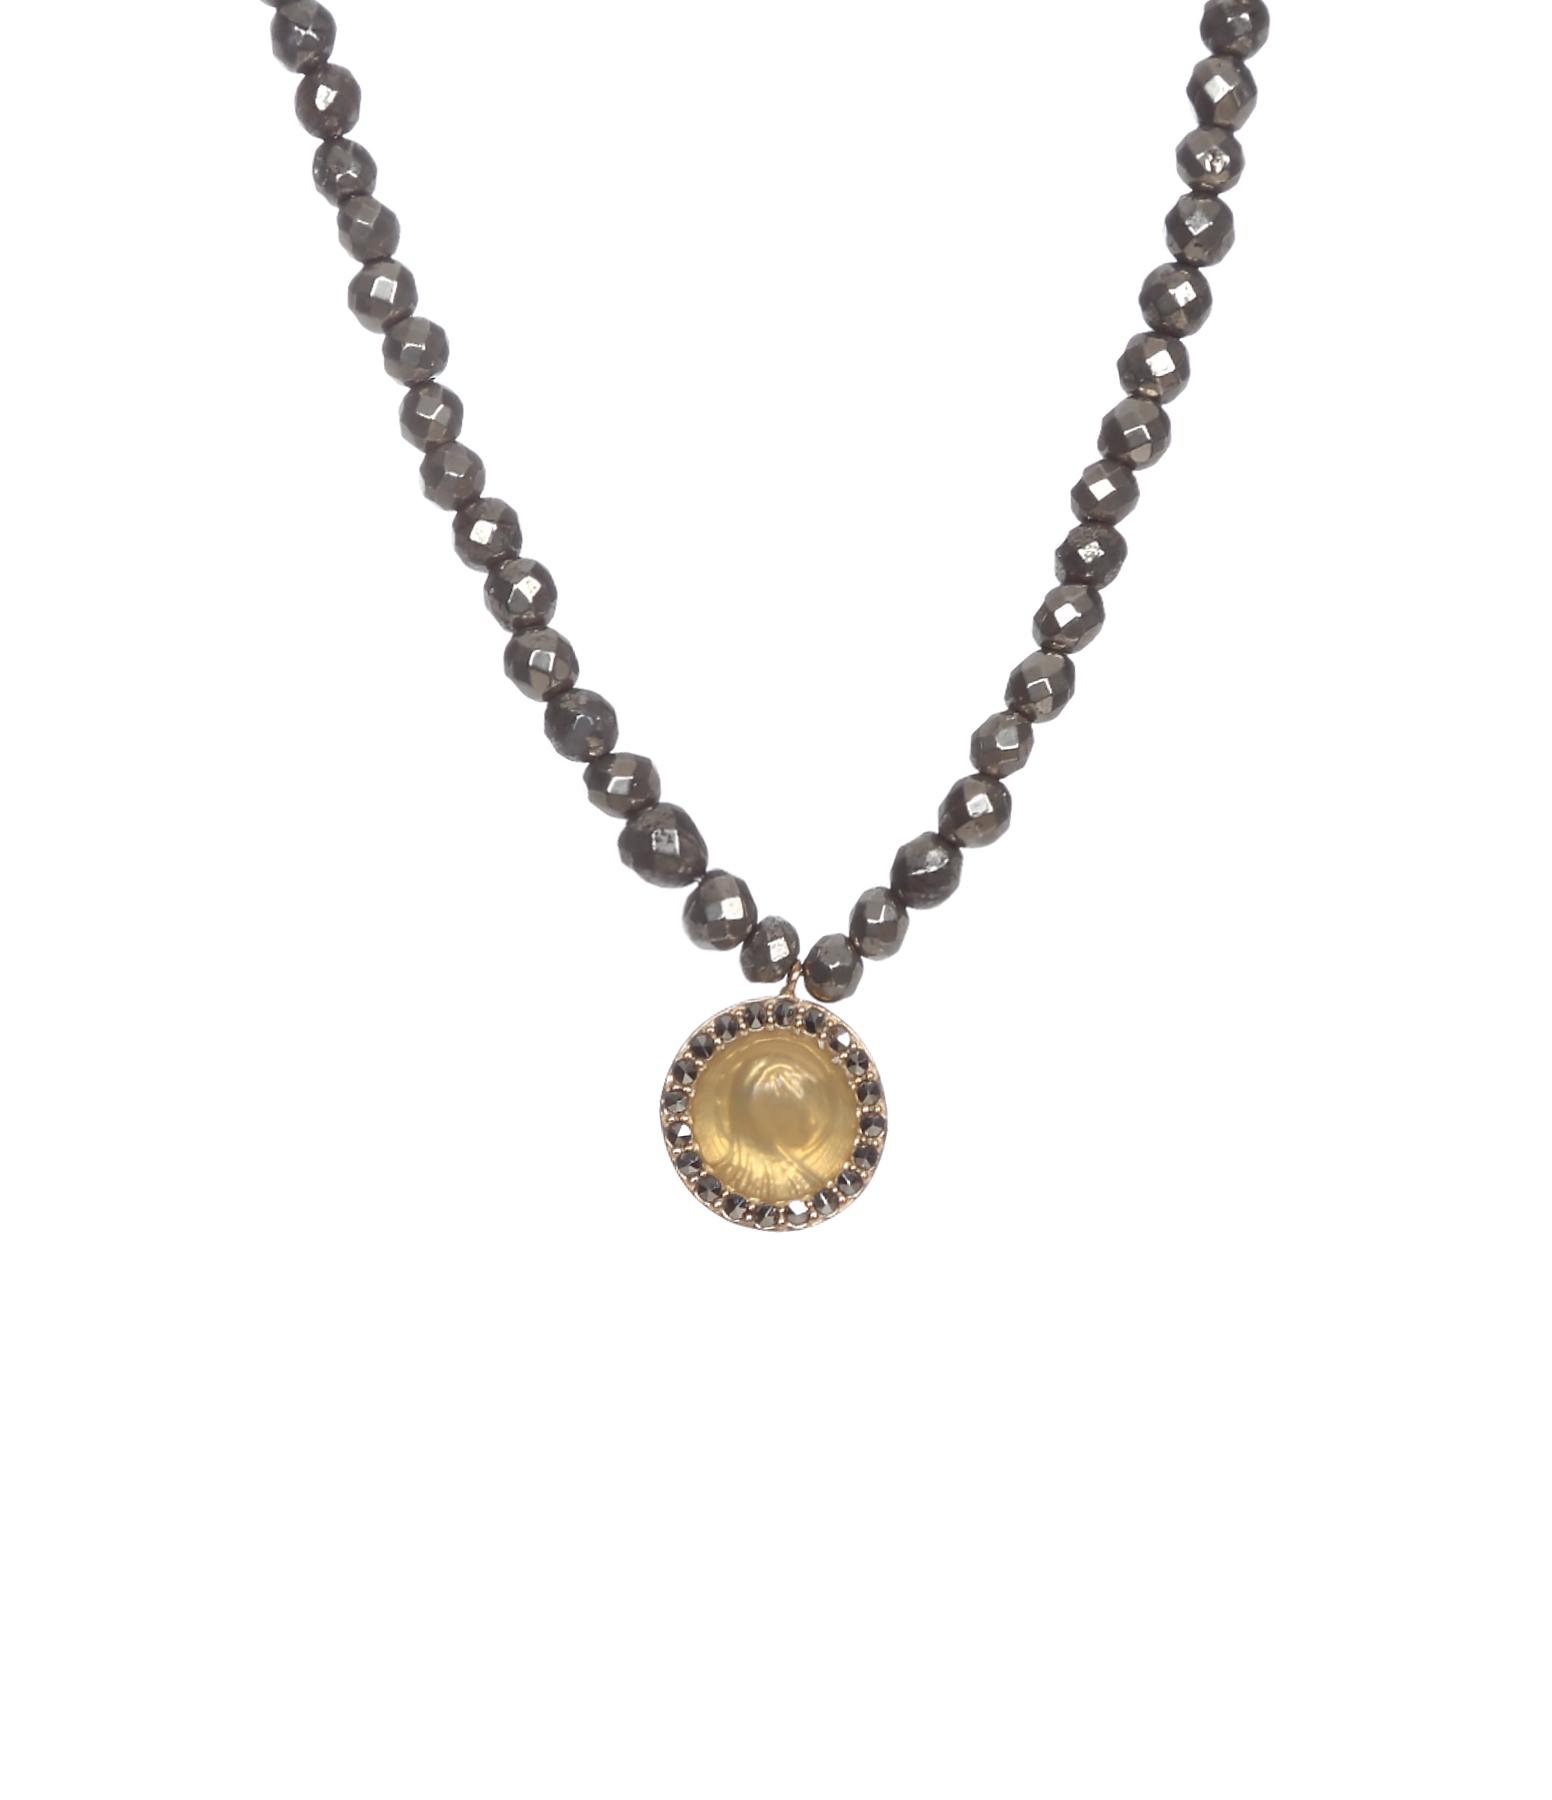 Collier Médaille Madone Ronde Marcassites 9K